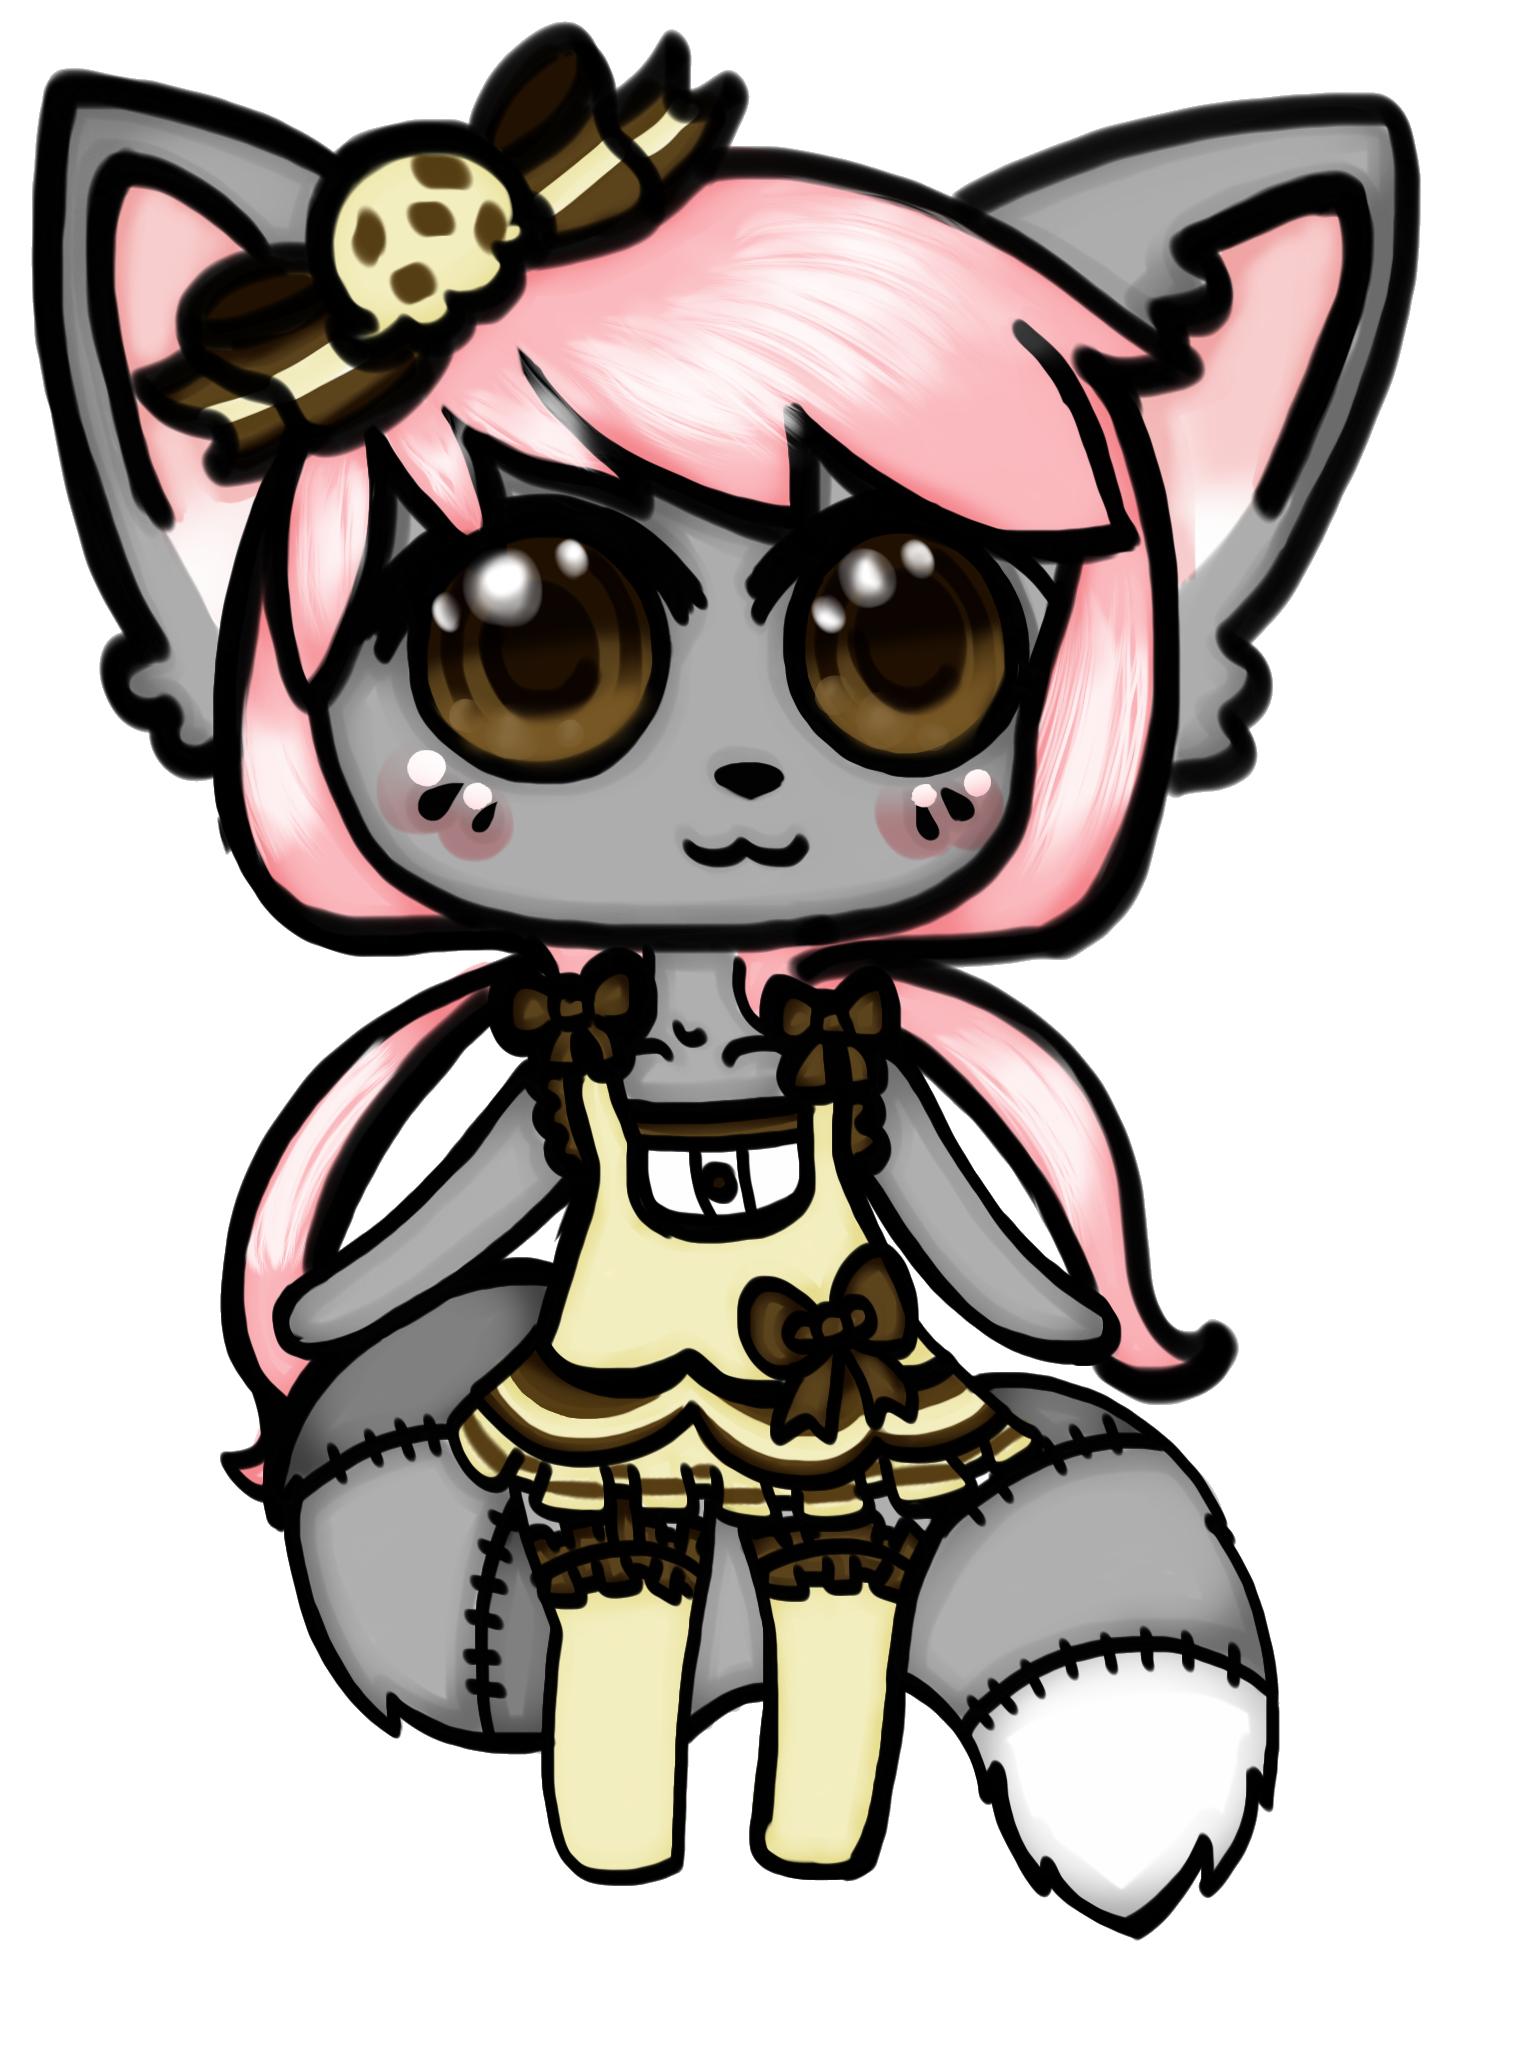 Little Miss Choco Chip by TinyFurrTails